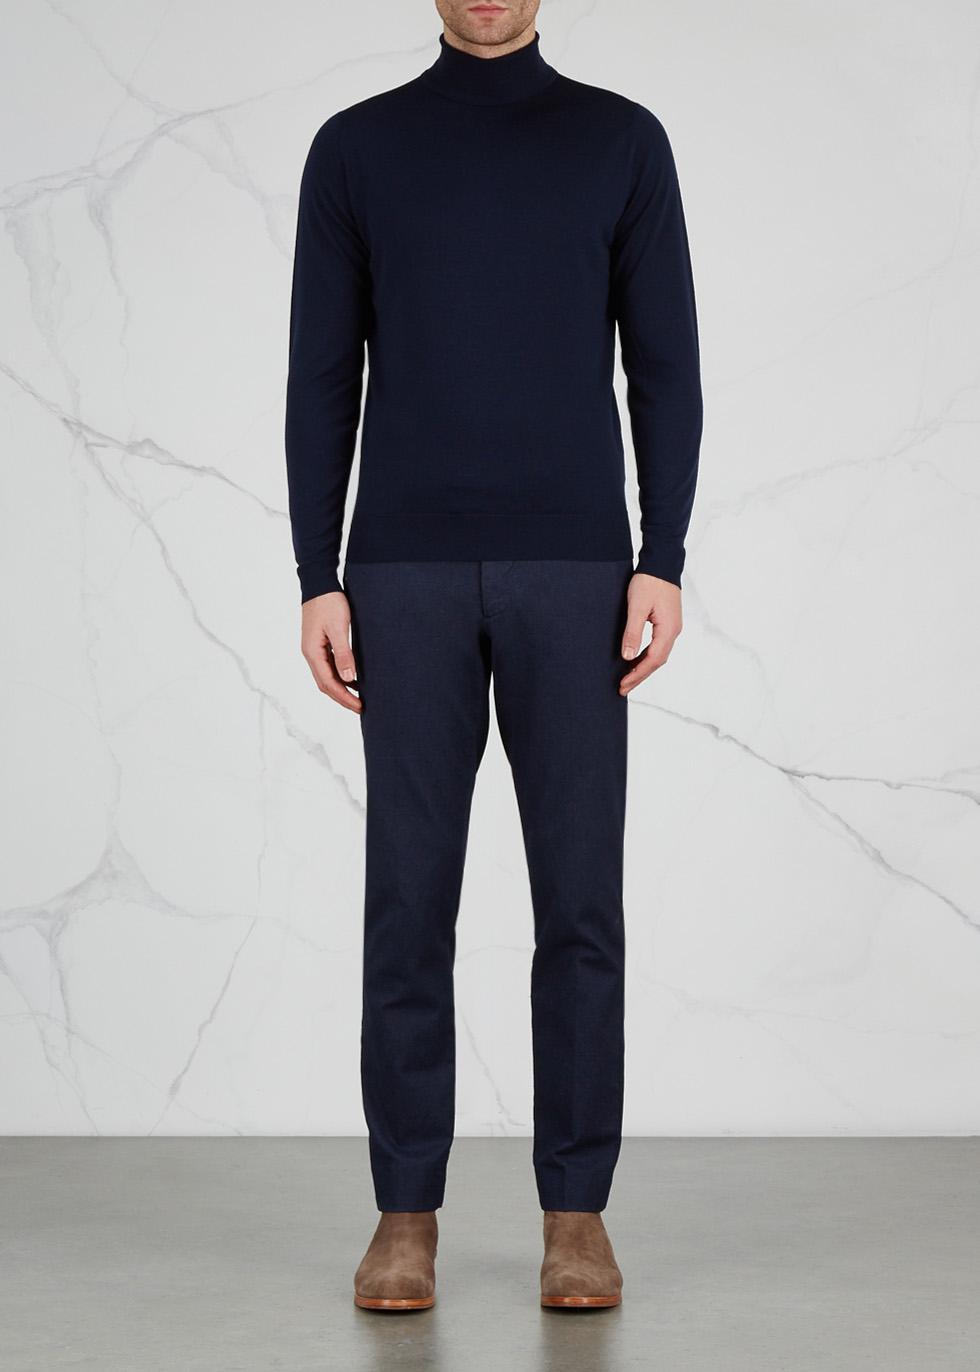 Cherwell navy merino wool jumper - John Smedley